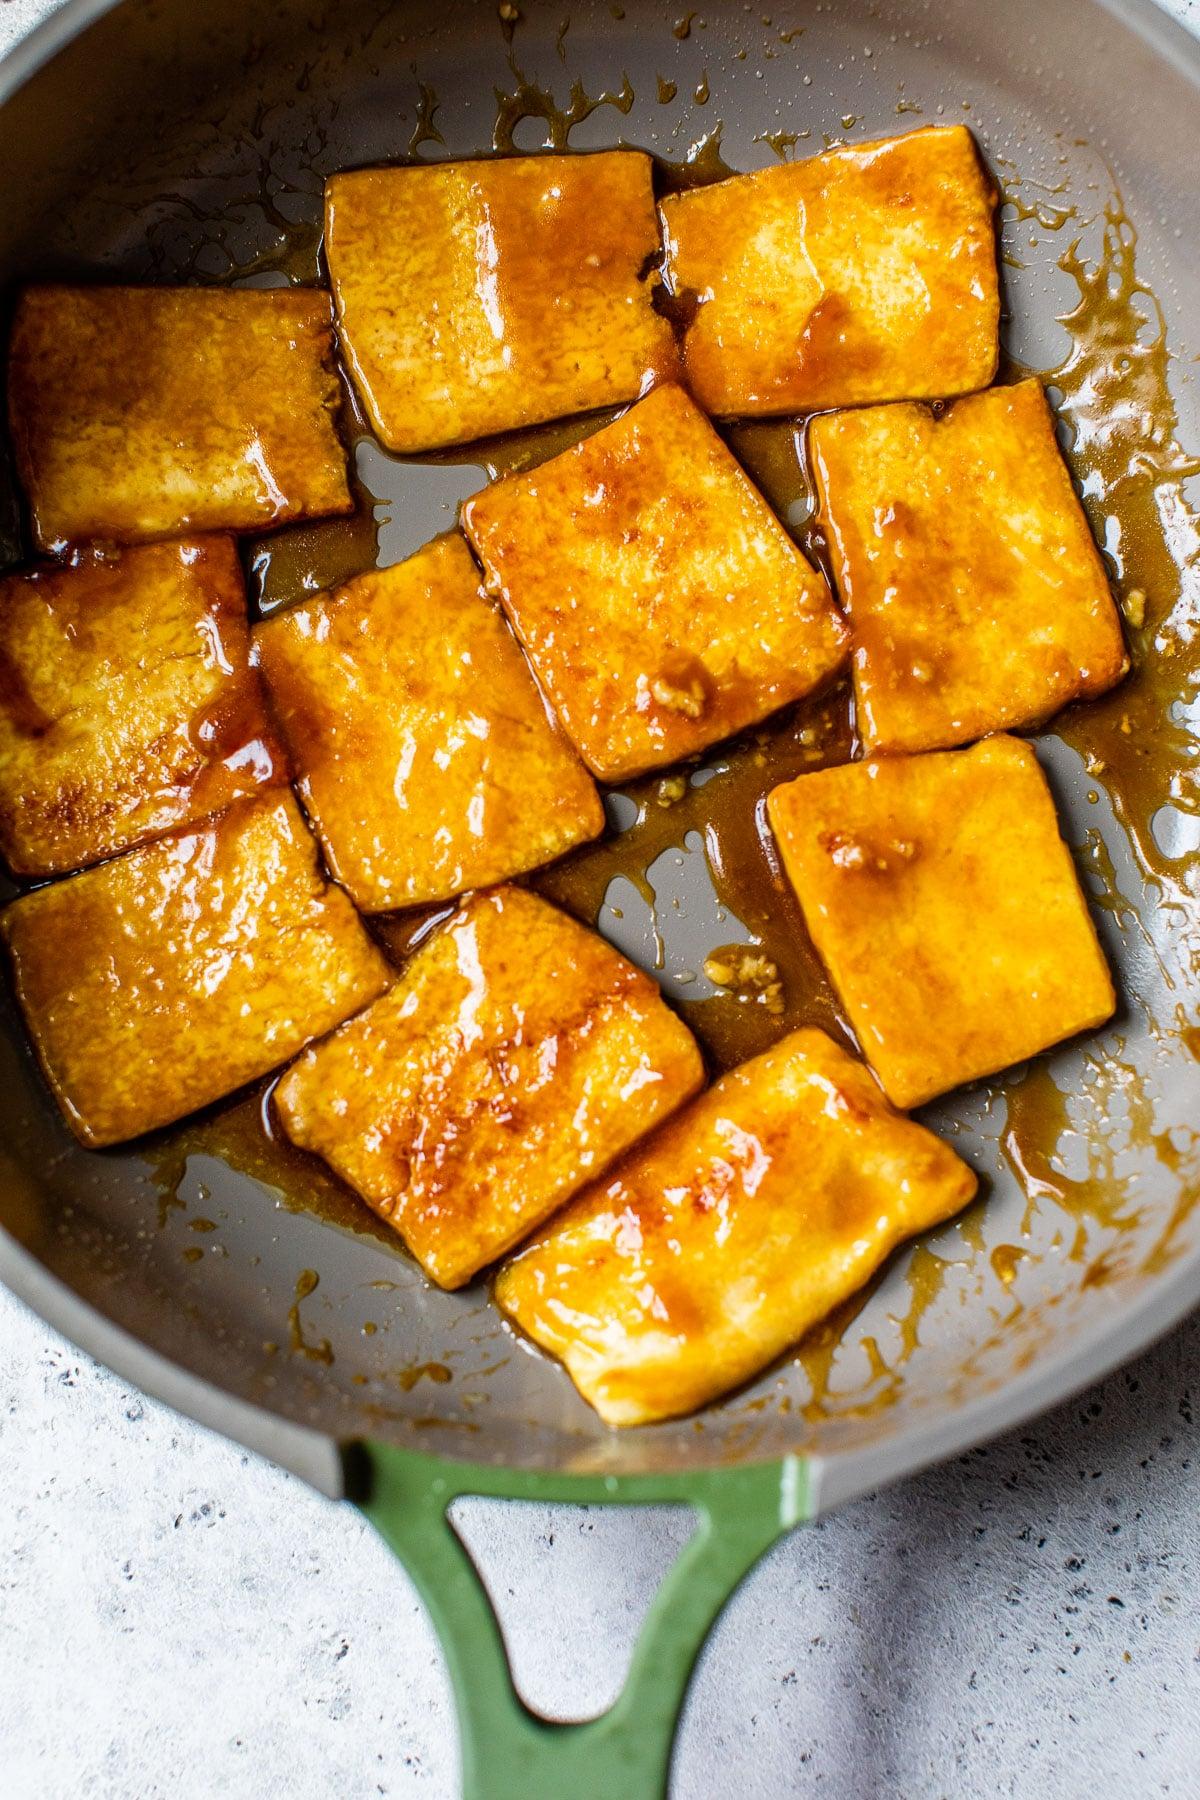 marinated tofu in a skillet